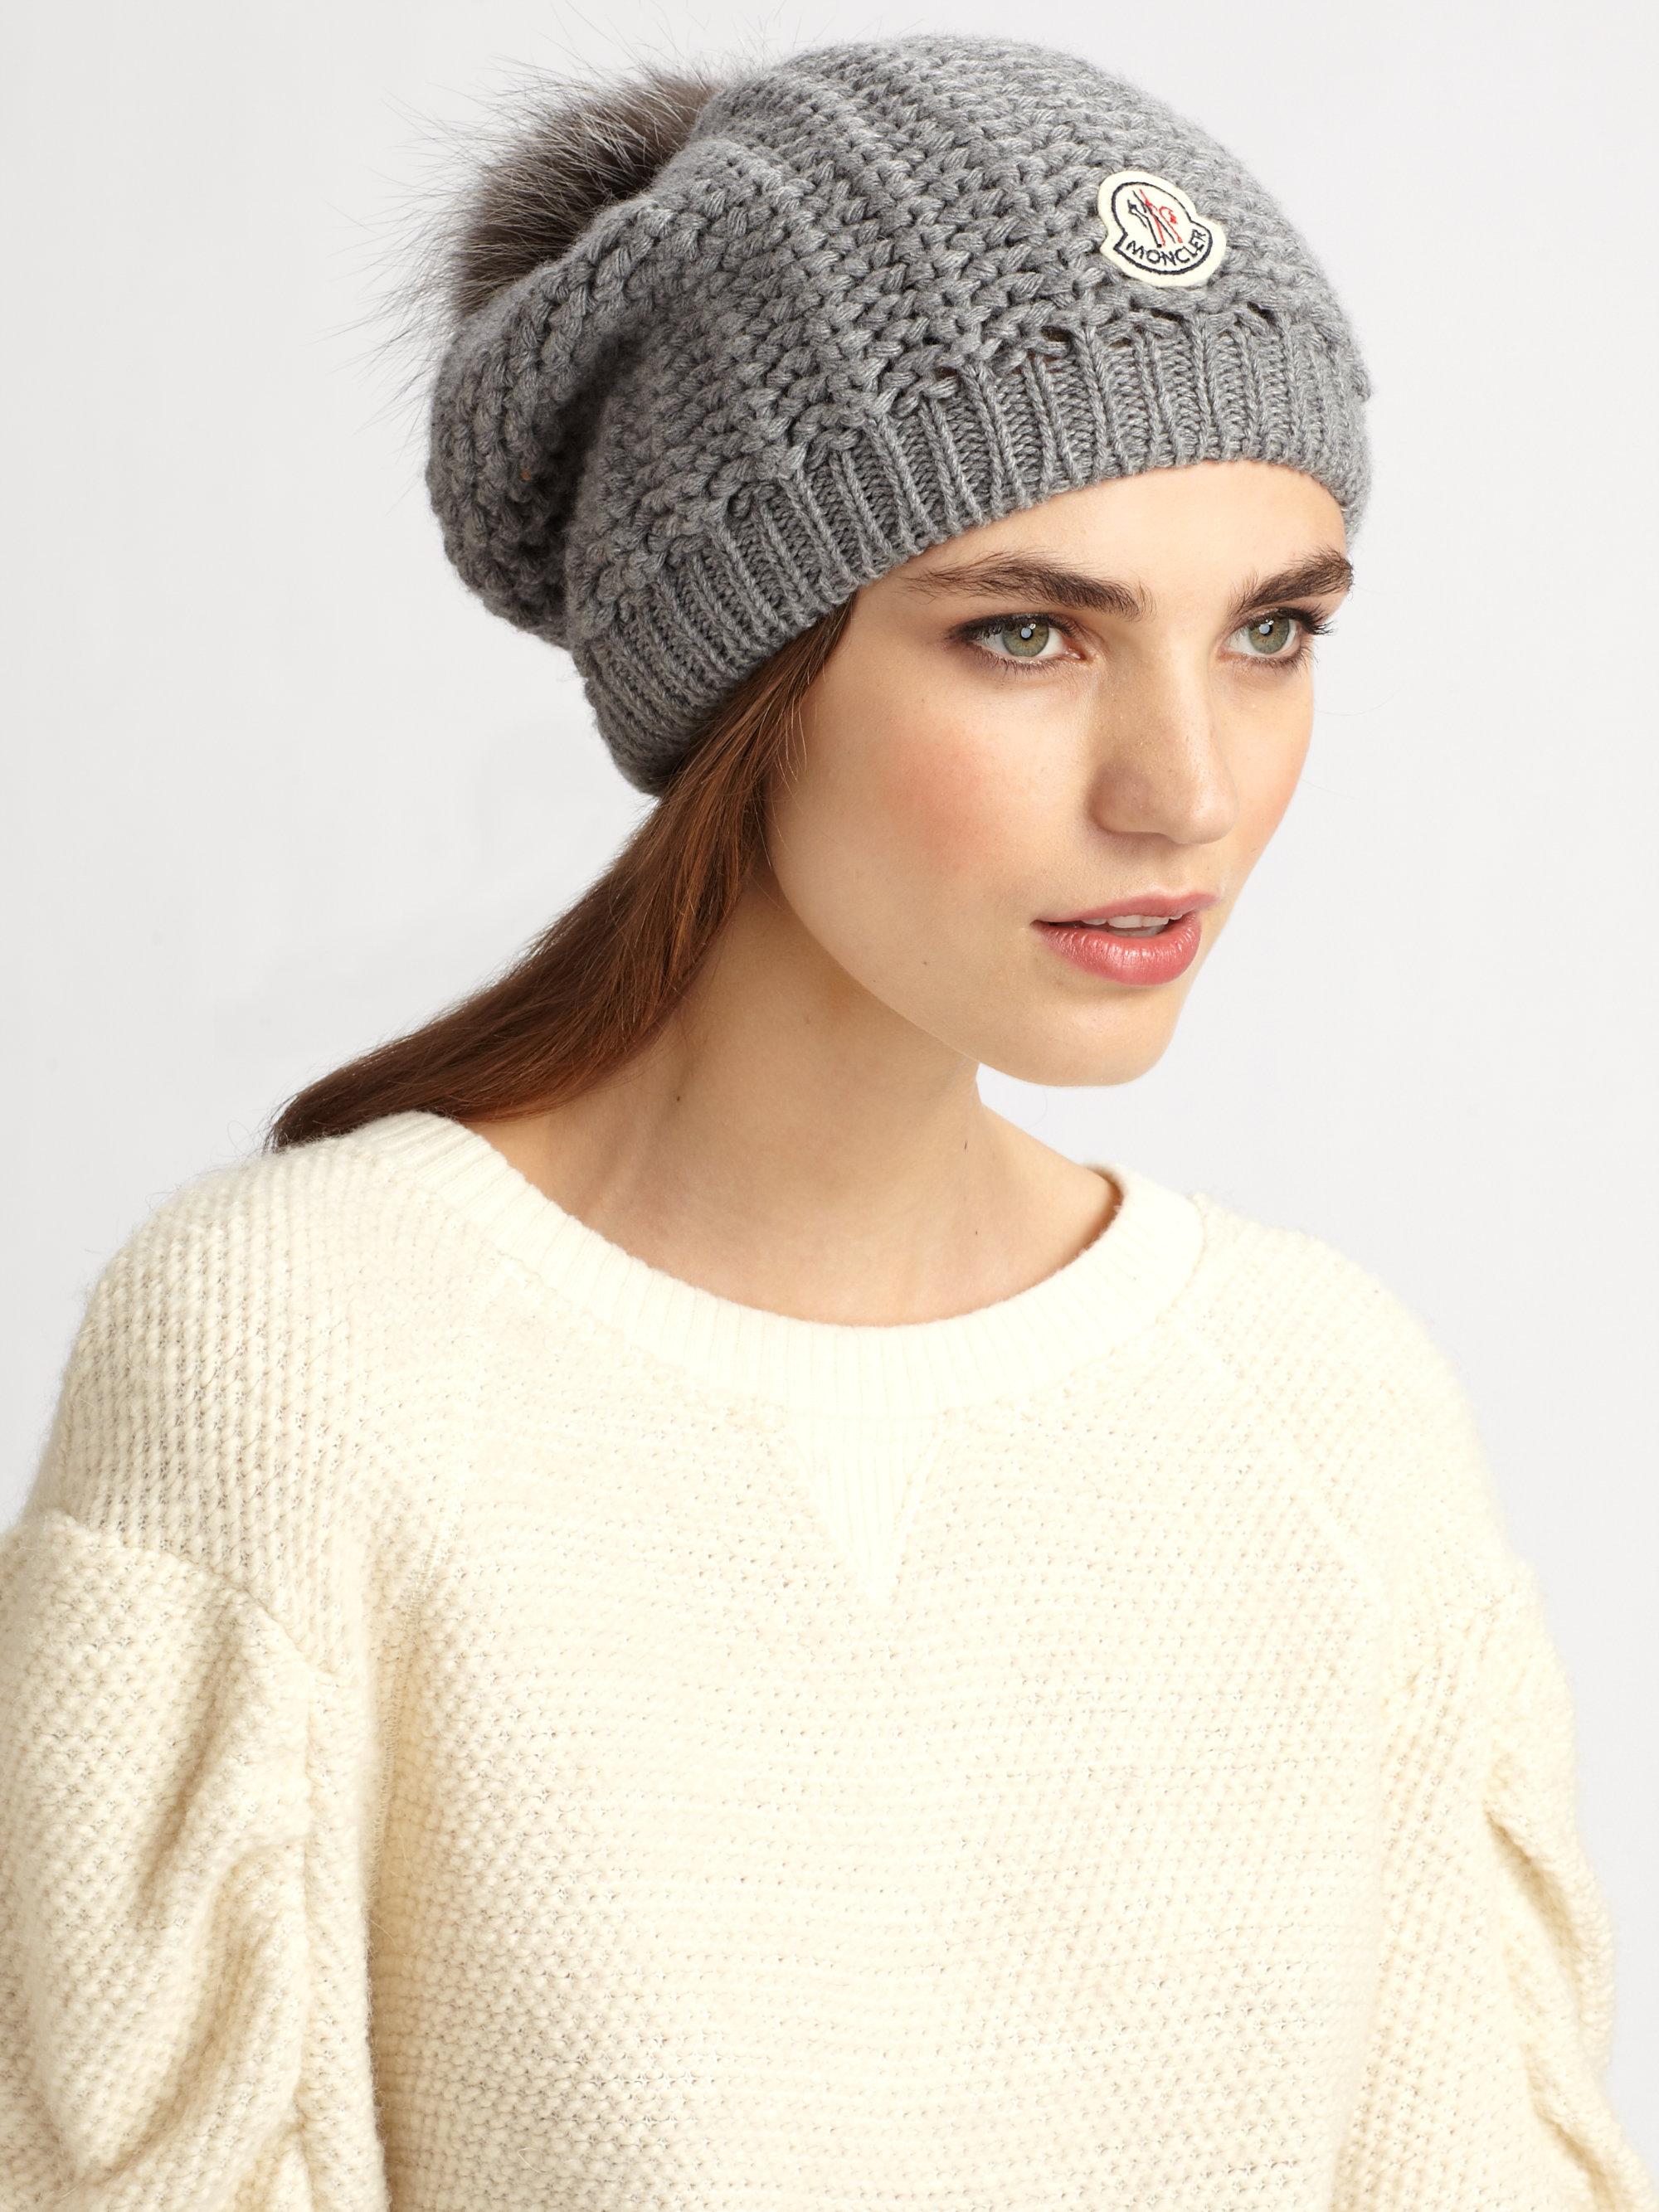 Lyst - Moncler Fox Pompom Knit Hat in Gray e5bdd8e9d1b